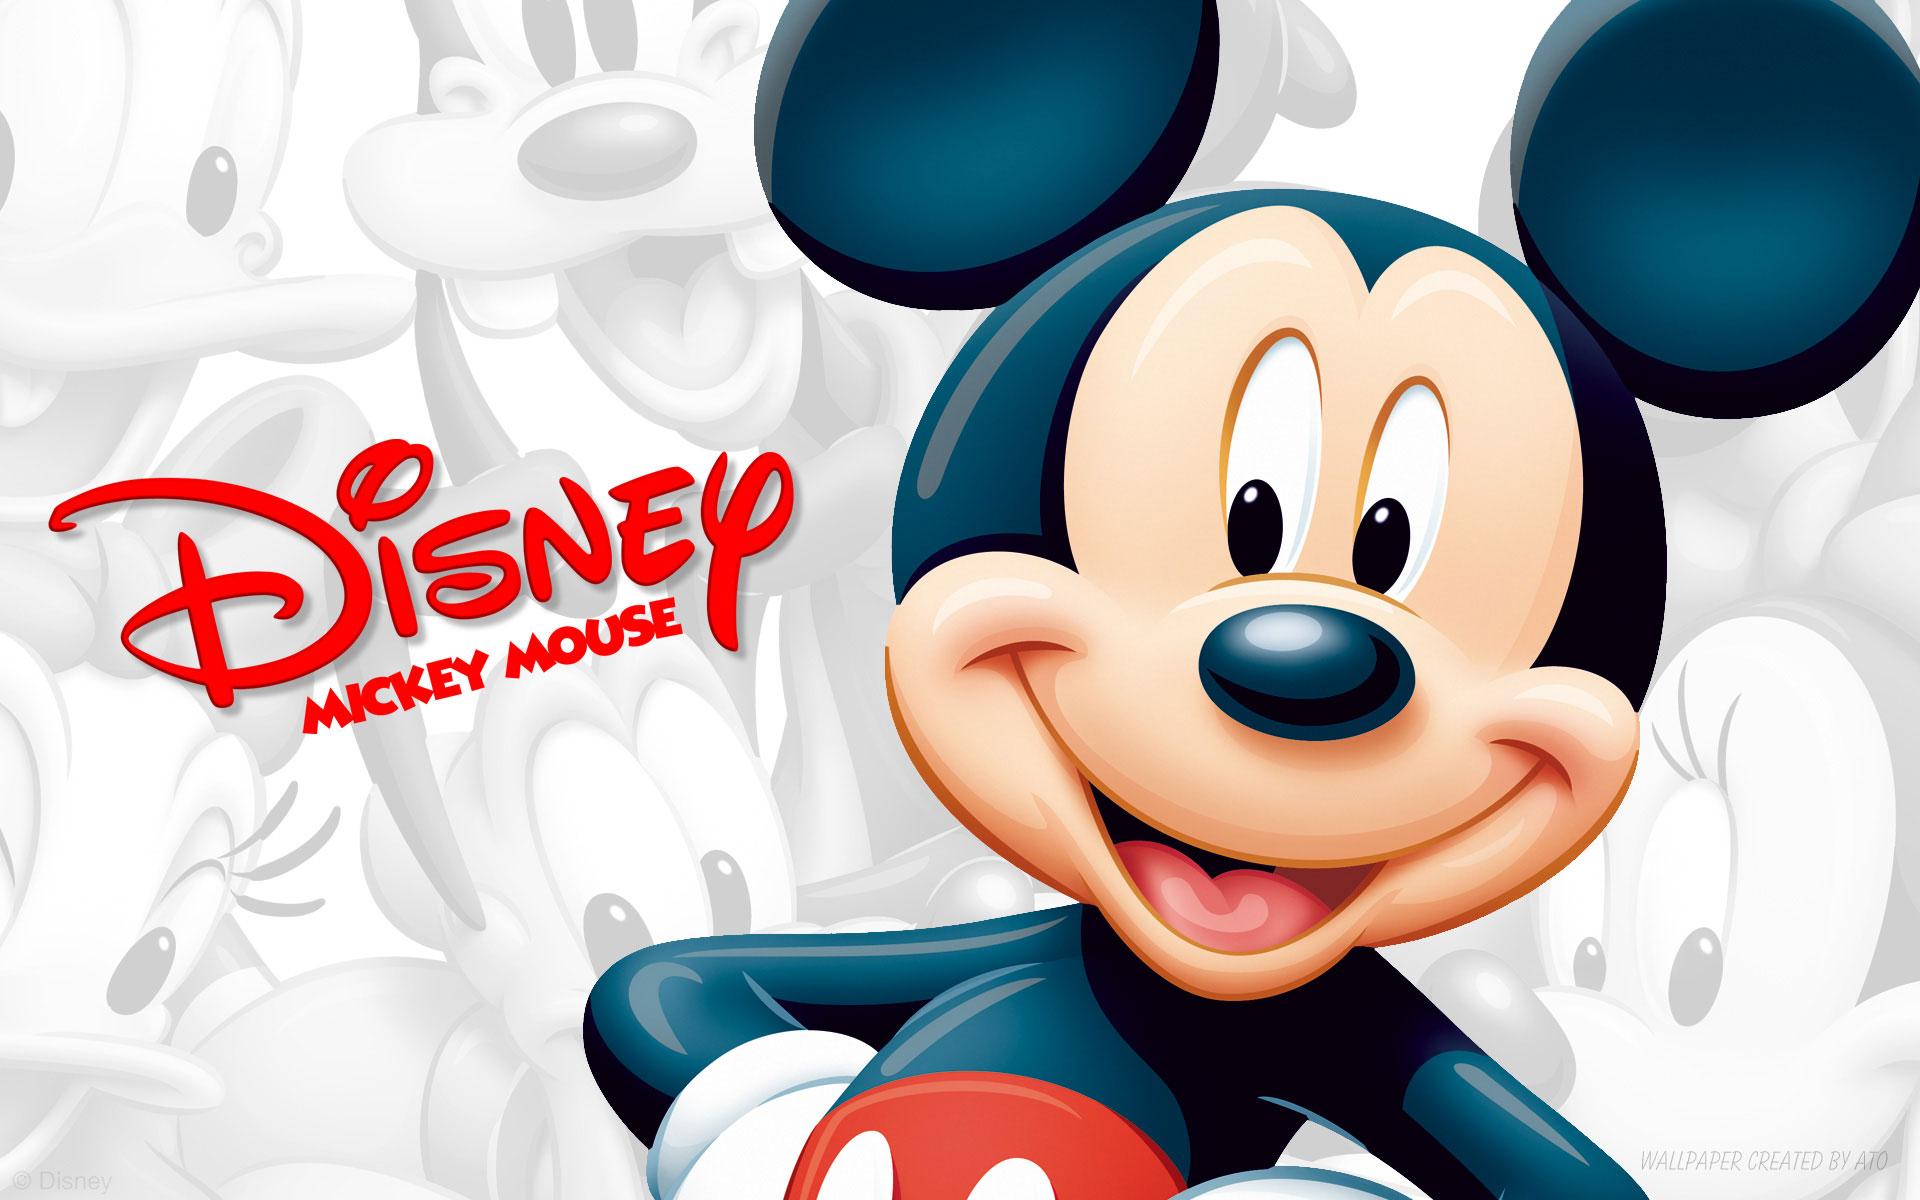 Mickey Mouse 3D Wallpaper - Mickey Mouse 3D Wallpaper